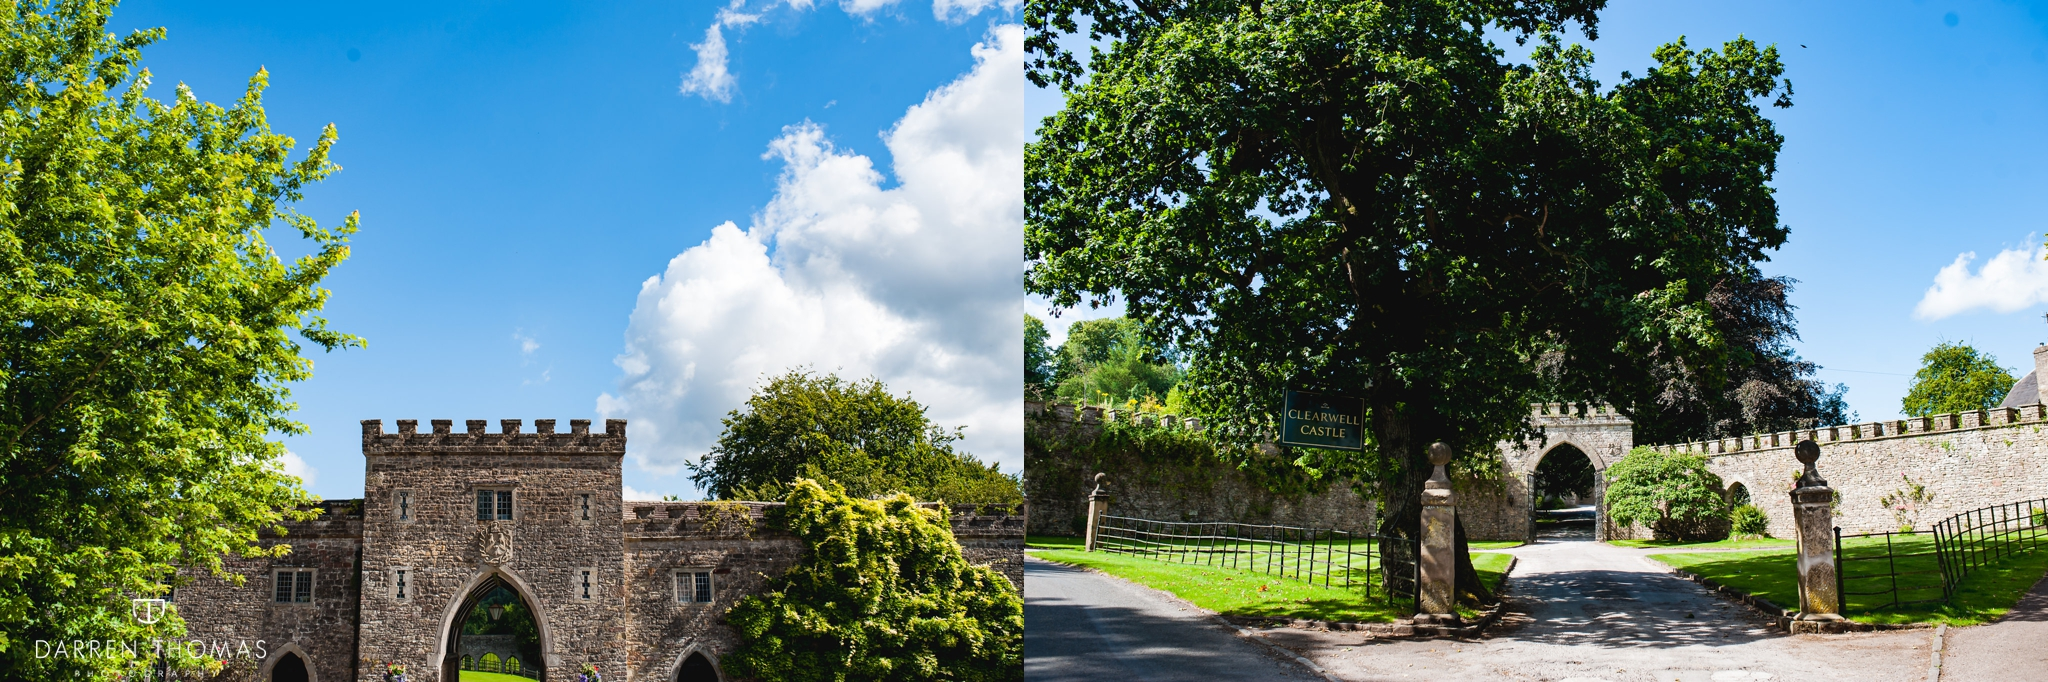 clearwell castle wedding_0001.jpg